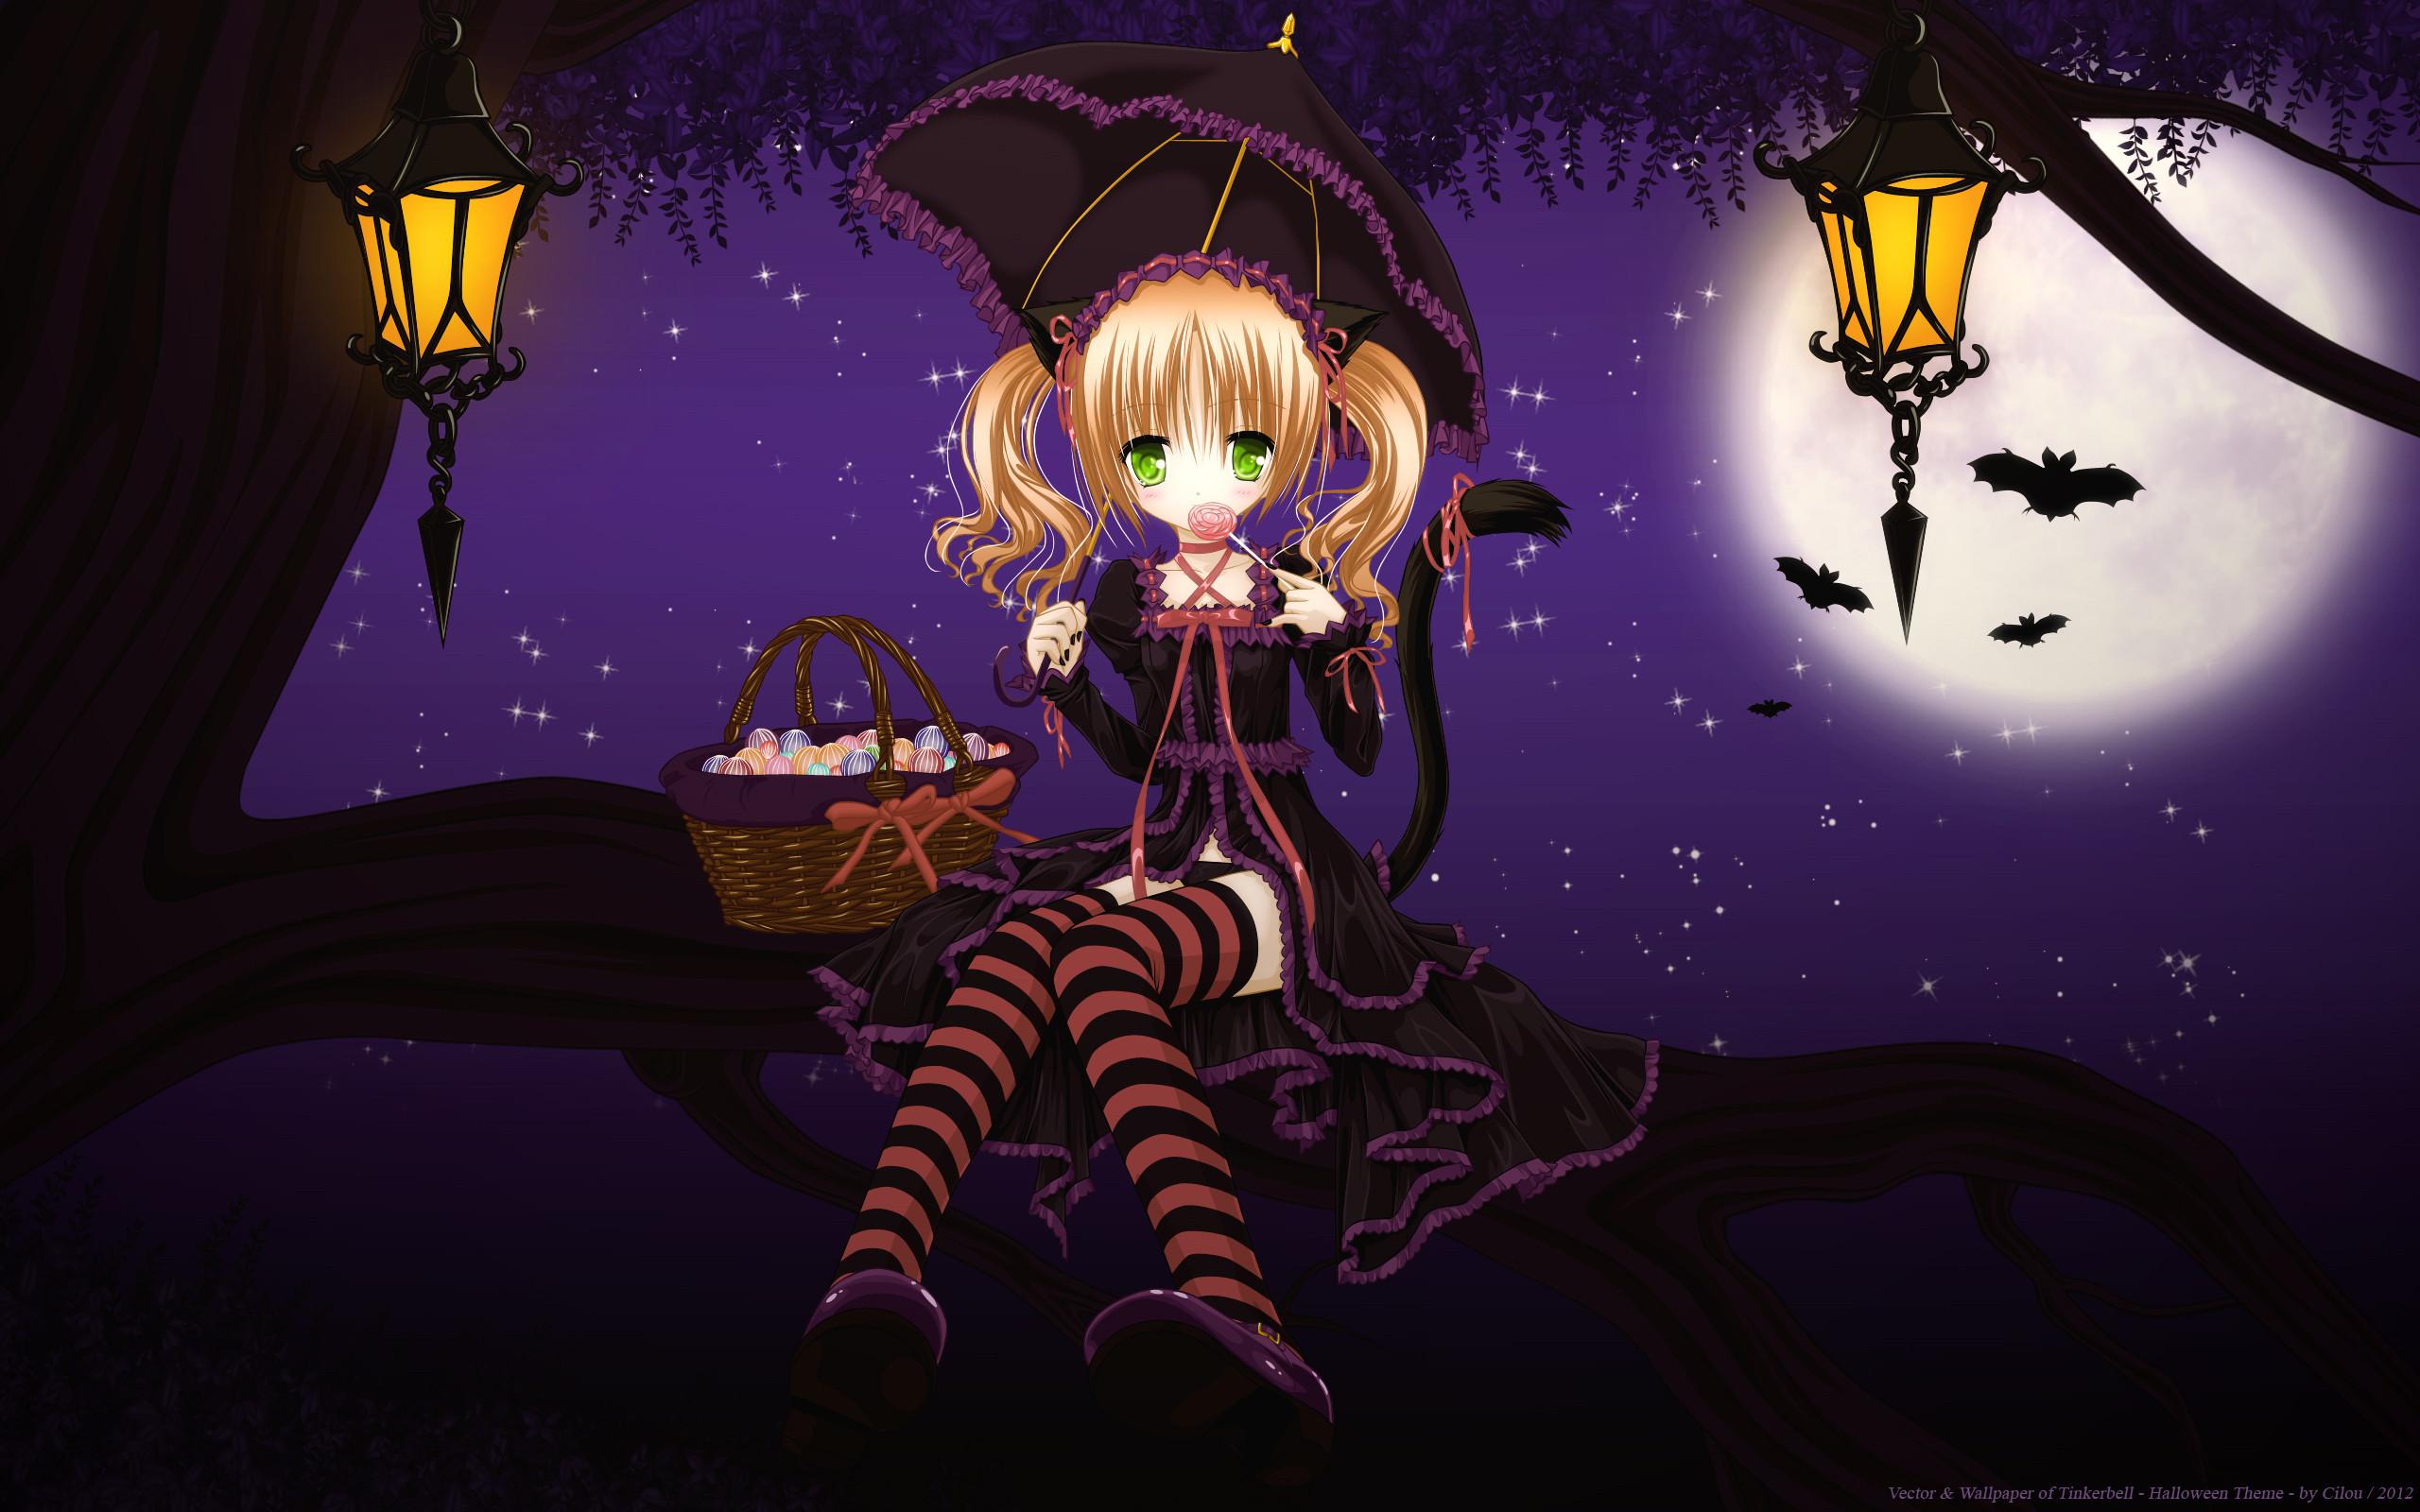 Fantastic Wallpaper Halloween Steampunk - 545960  Trends_648497.jpg